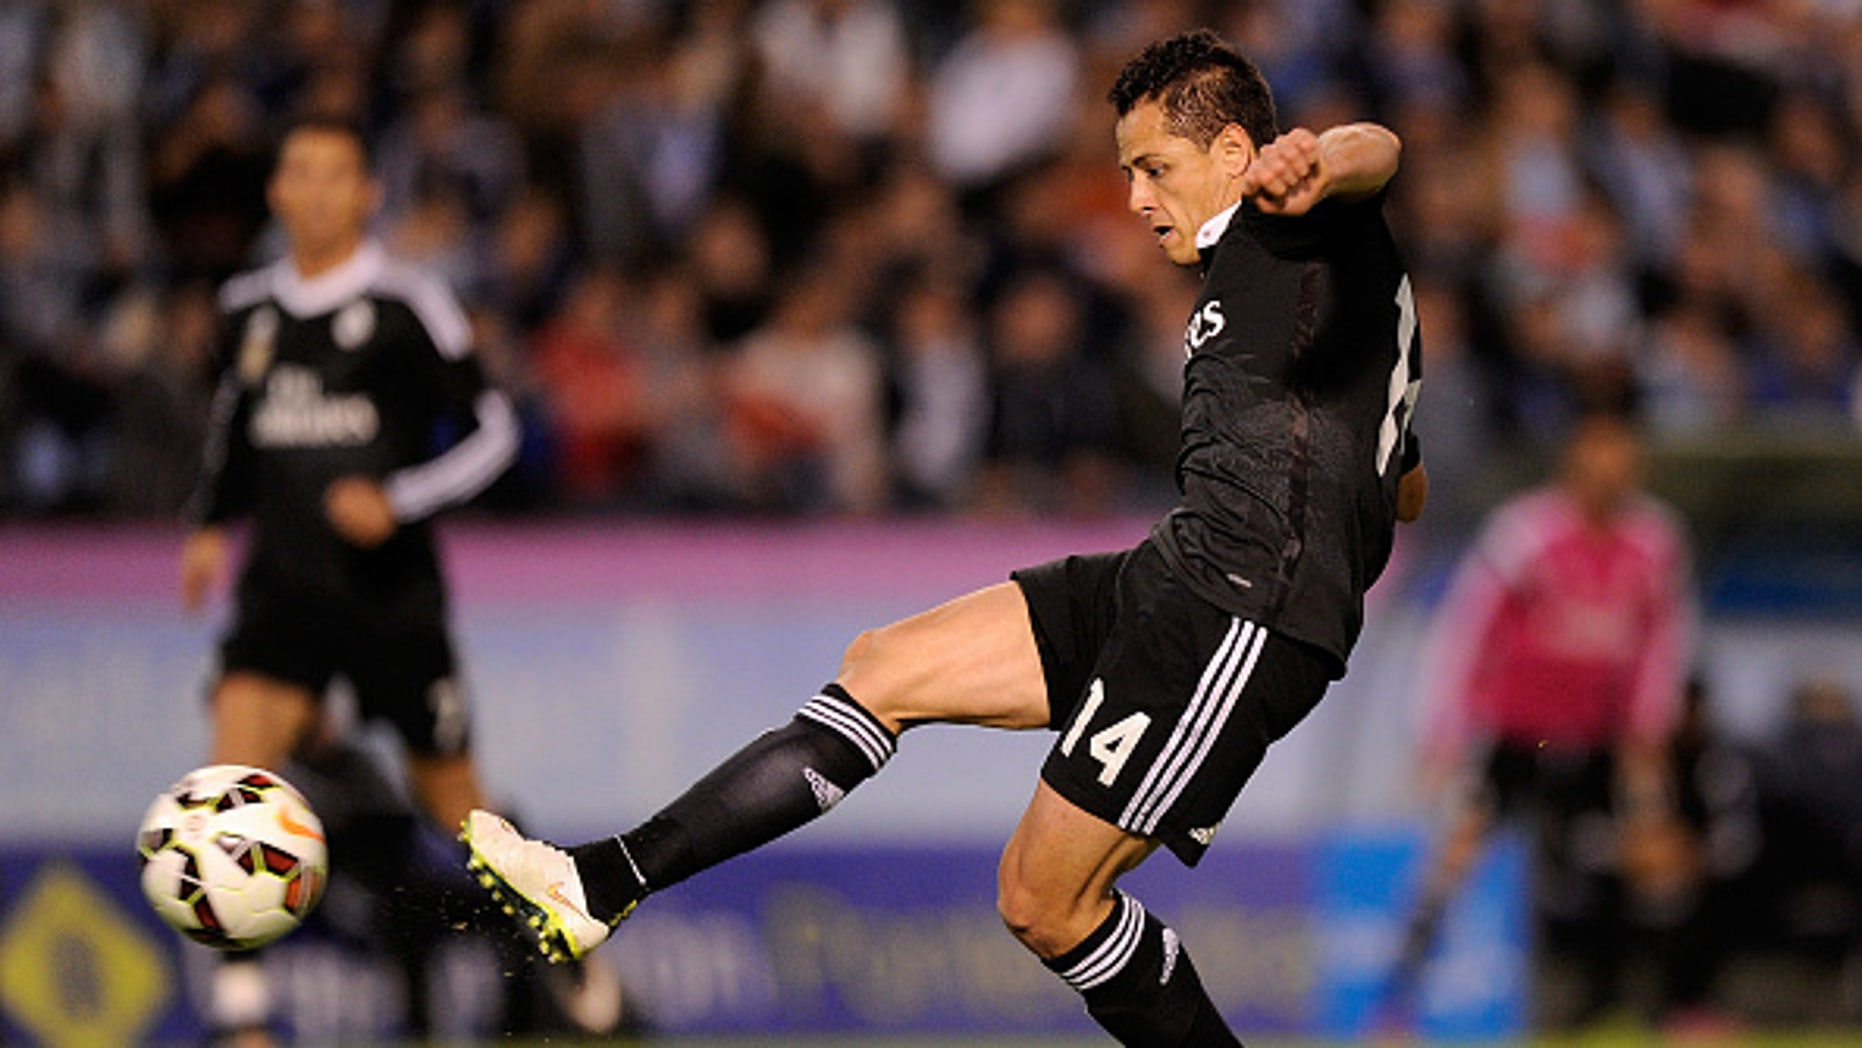 VIGO, SPAIN - APRIL 26:  Javier & Chicharito Hernandez of Real Madrid scores Real's 4th goal during the La Liga match between Celta Vigo and Real Madrid CF at Estadio Balaidos in Vigo, Spain.